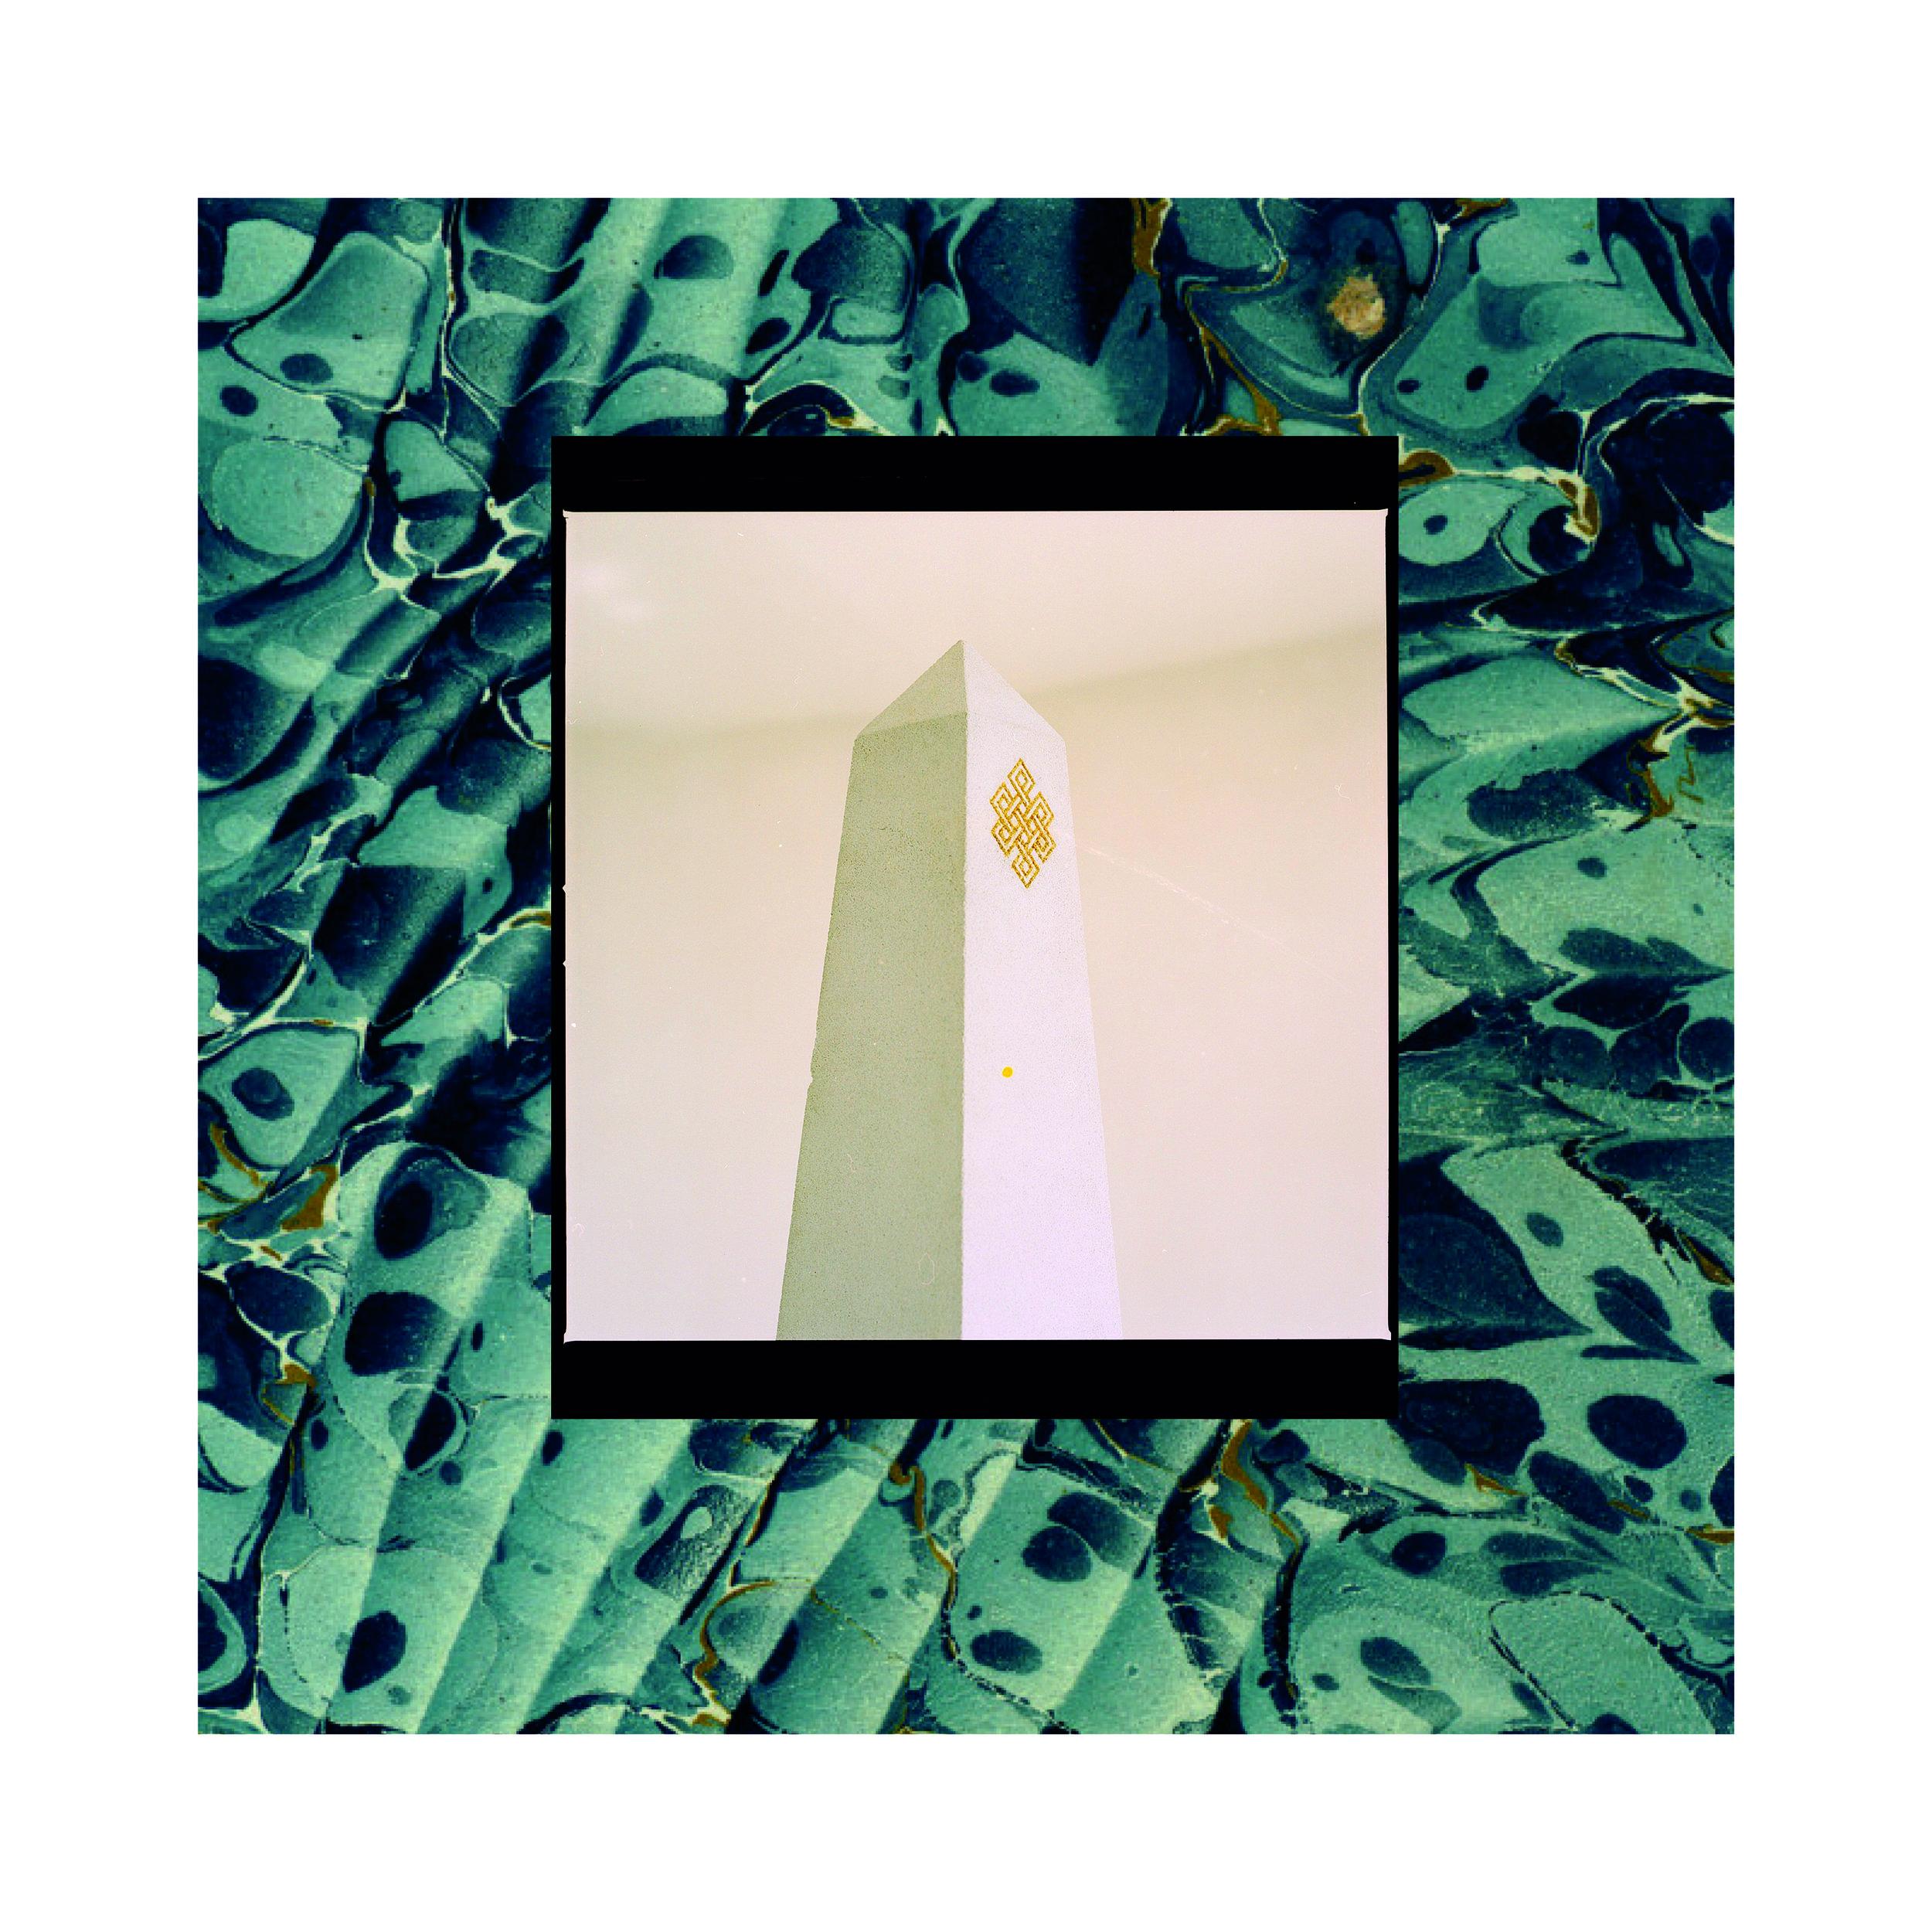 Samana, Samana music, Ascension. Ascension album, Samana obelisk, ancient obelisk